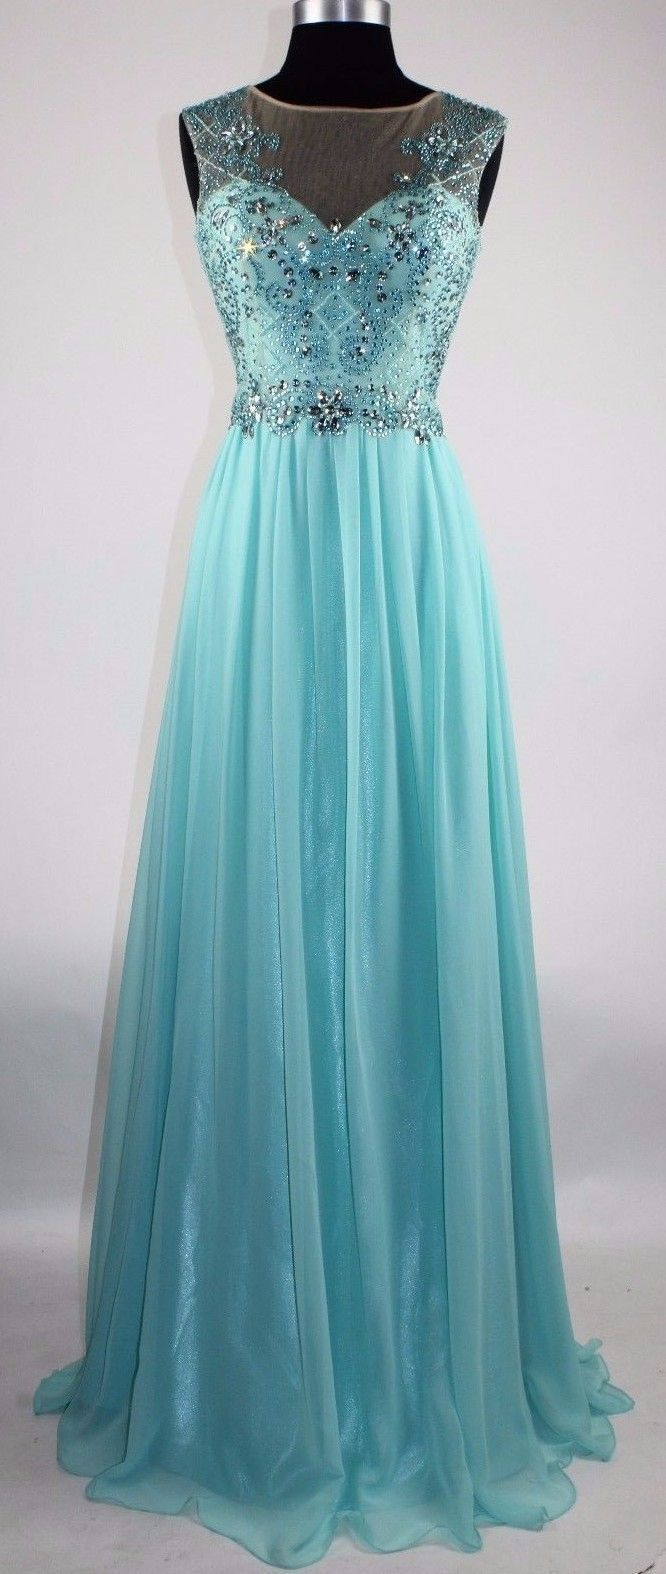 Charming Prom Dress, Sleeveless Beaded Prom Dresses,Sexy Evening